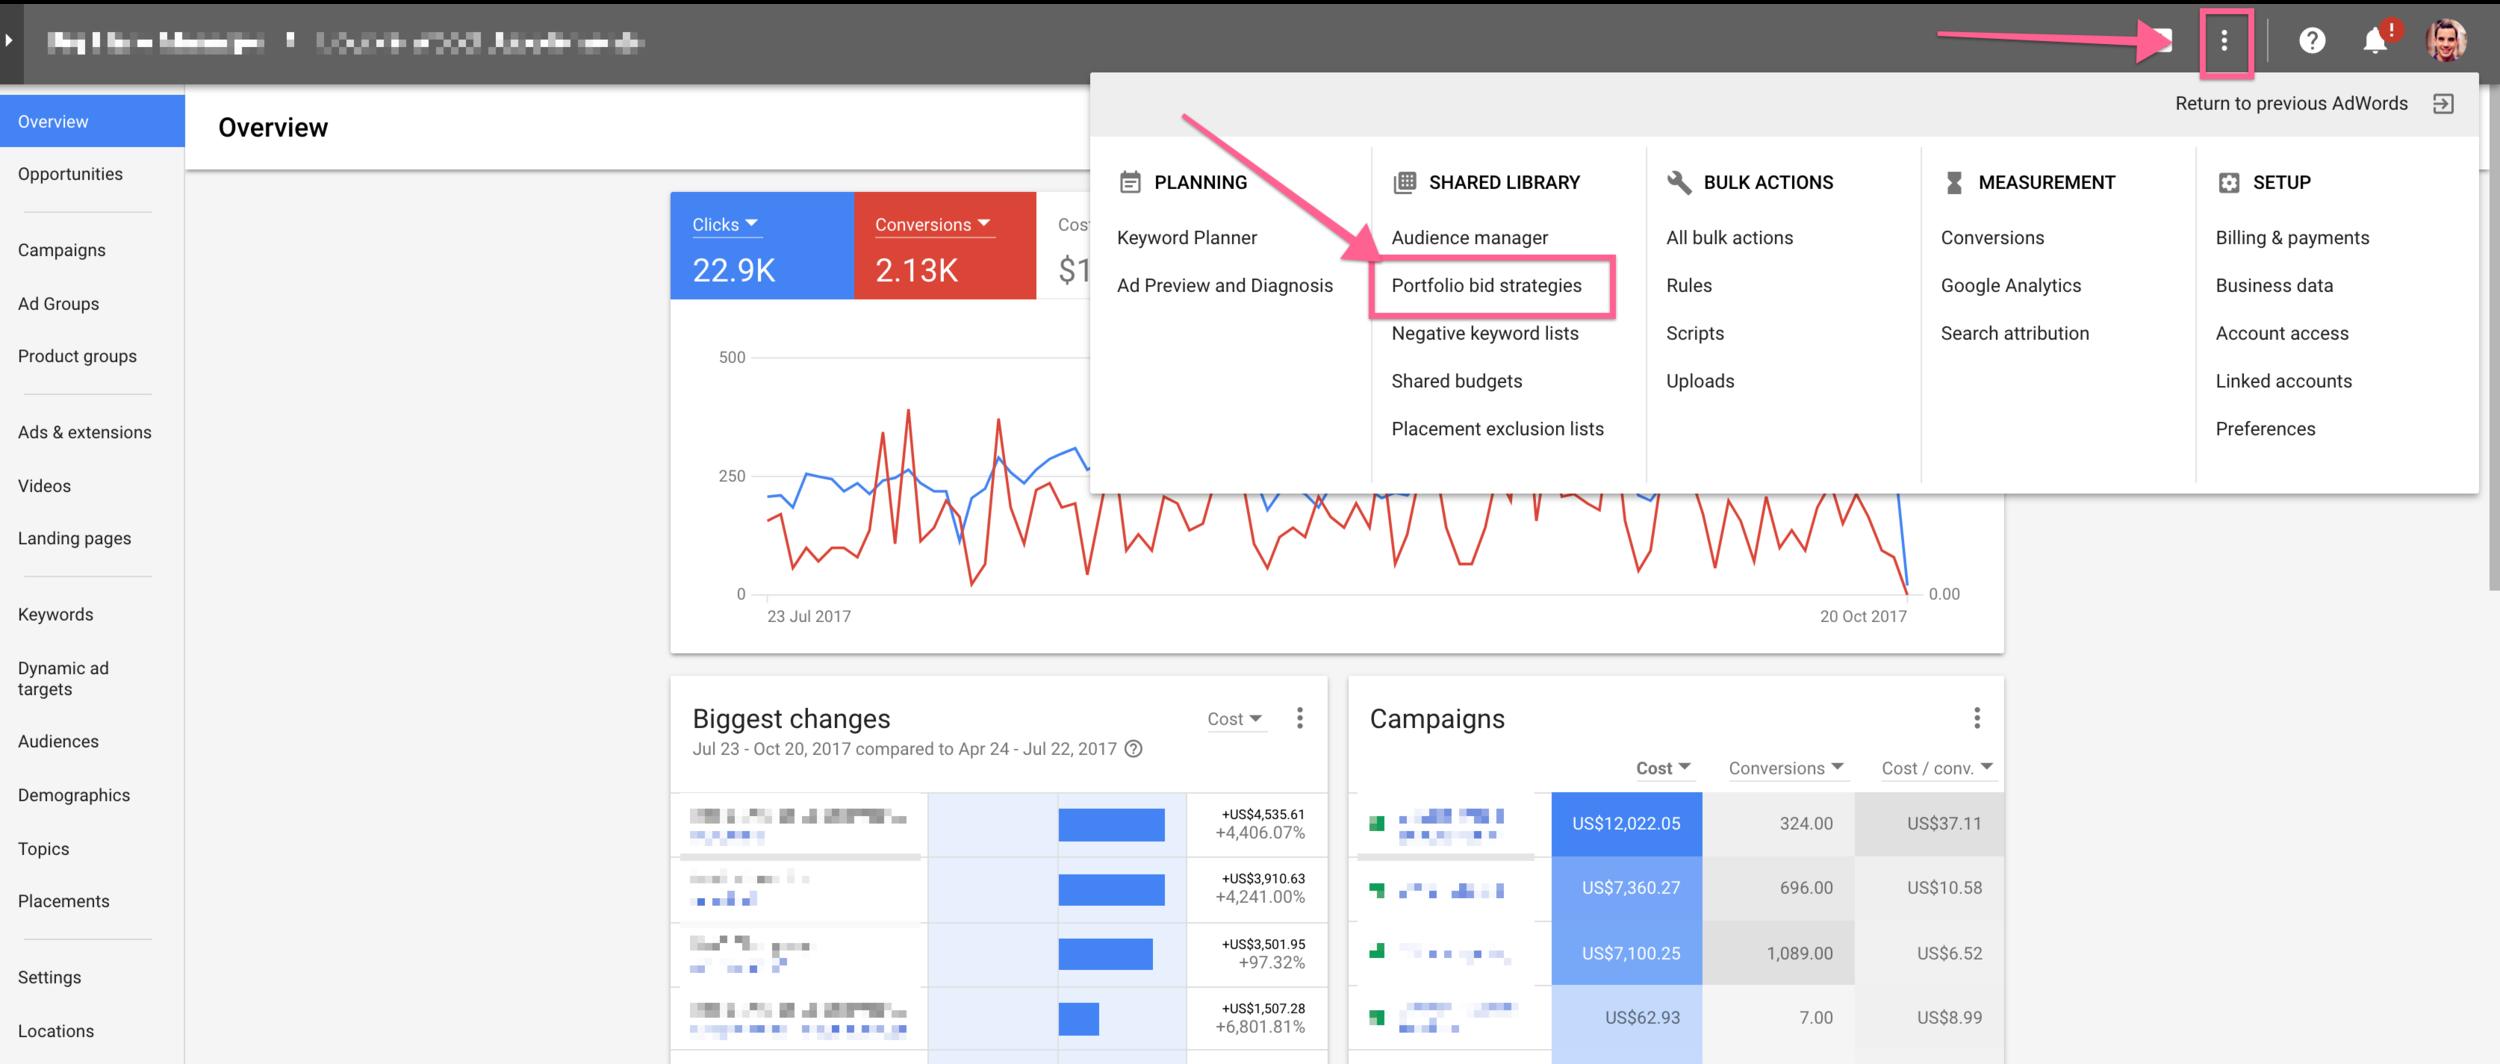 portfolio bid strategies in the new adwords interface.png